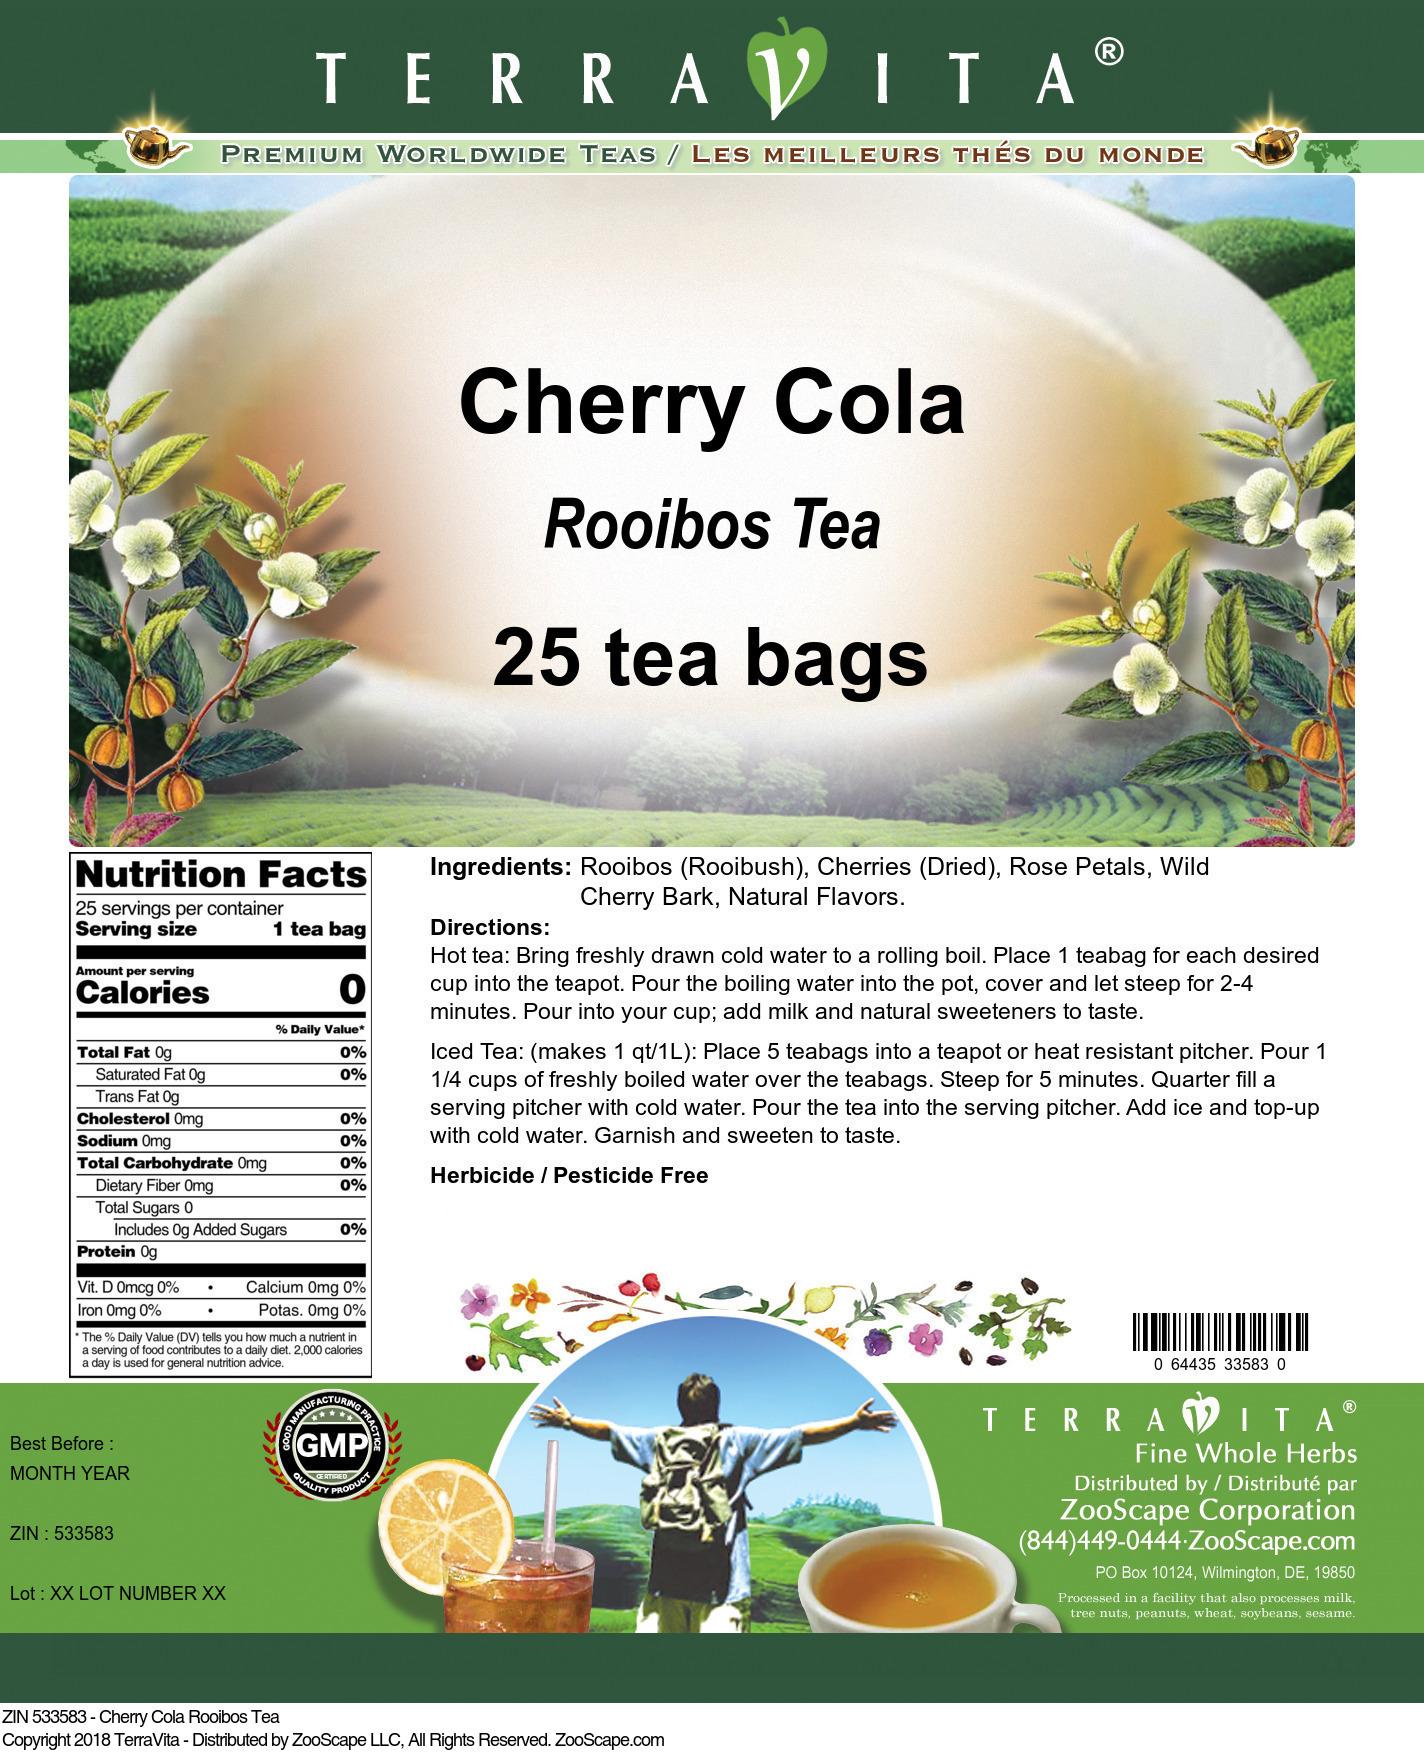 Cherry Cola Rooibos Tea